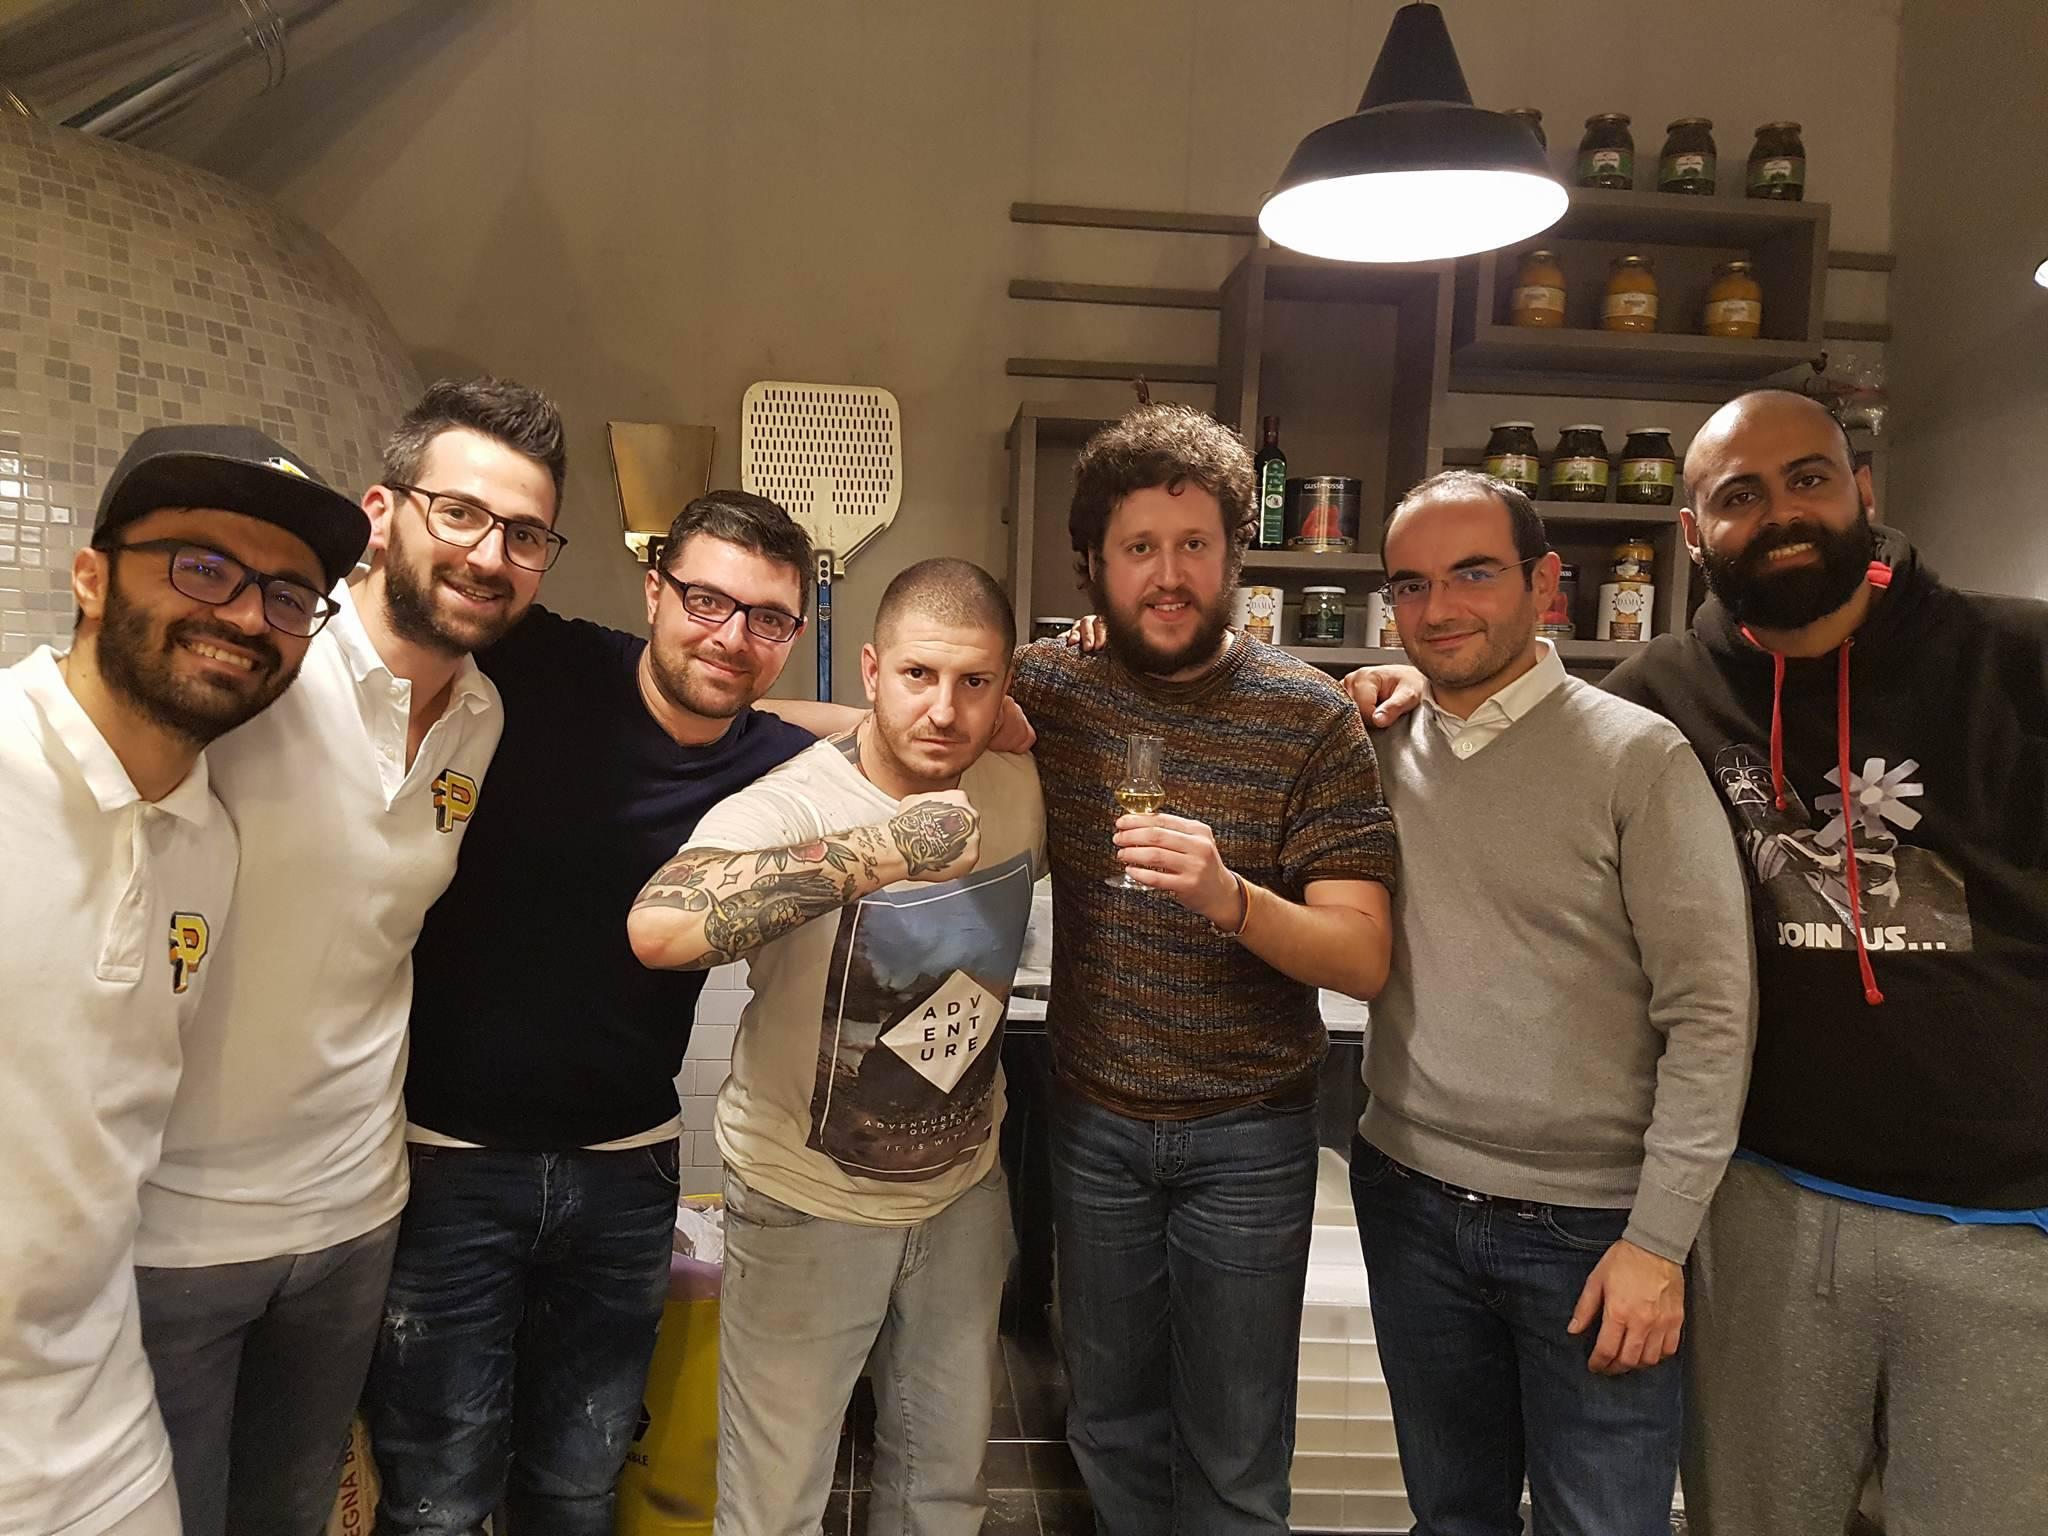 Francesco, Daniele F, Roberto, Daniele P, Shane, Franco, Daniel (photo by ?)